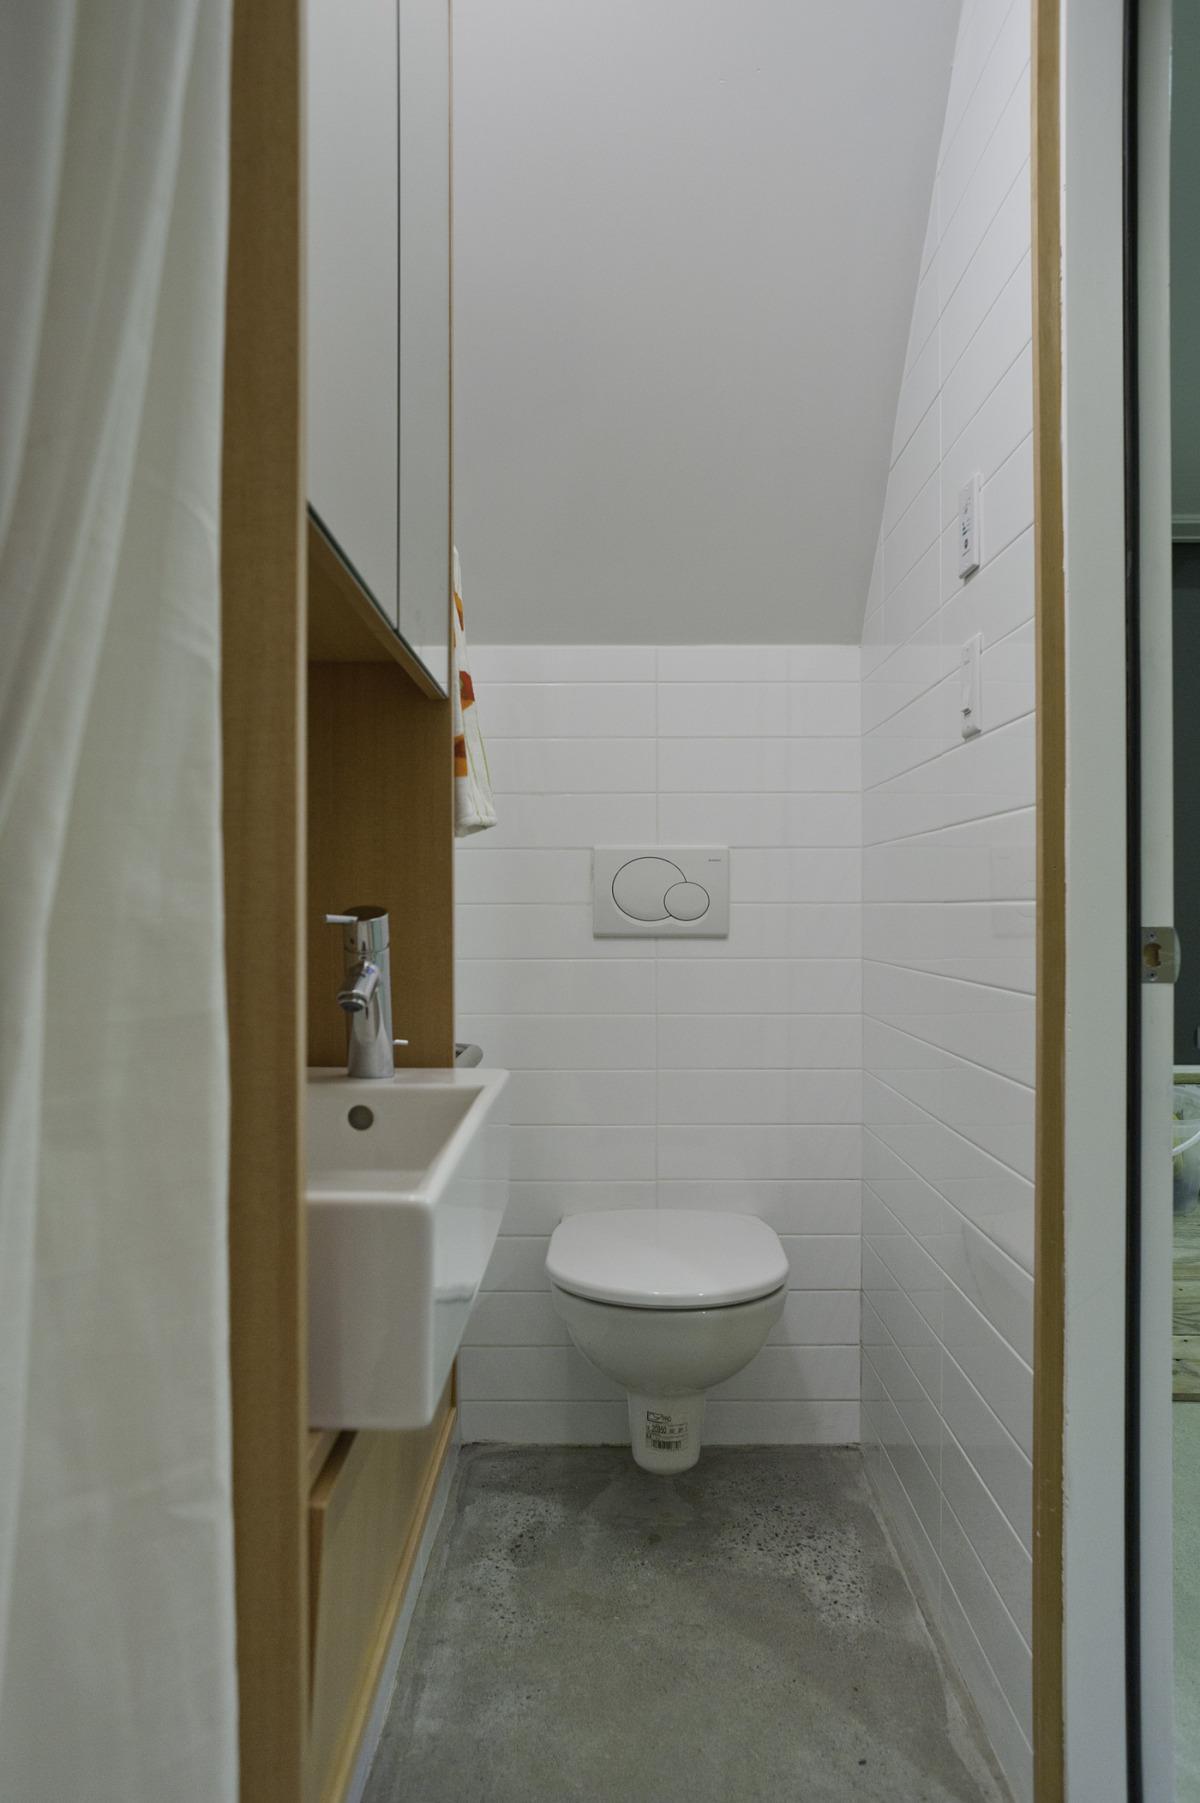 Gallery net zero solar laneway house by lanefab design for Garage bathroom decor